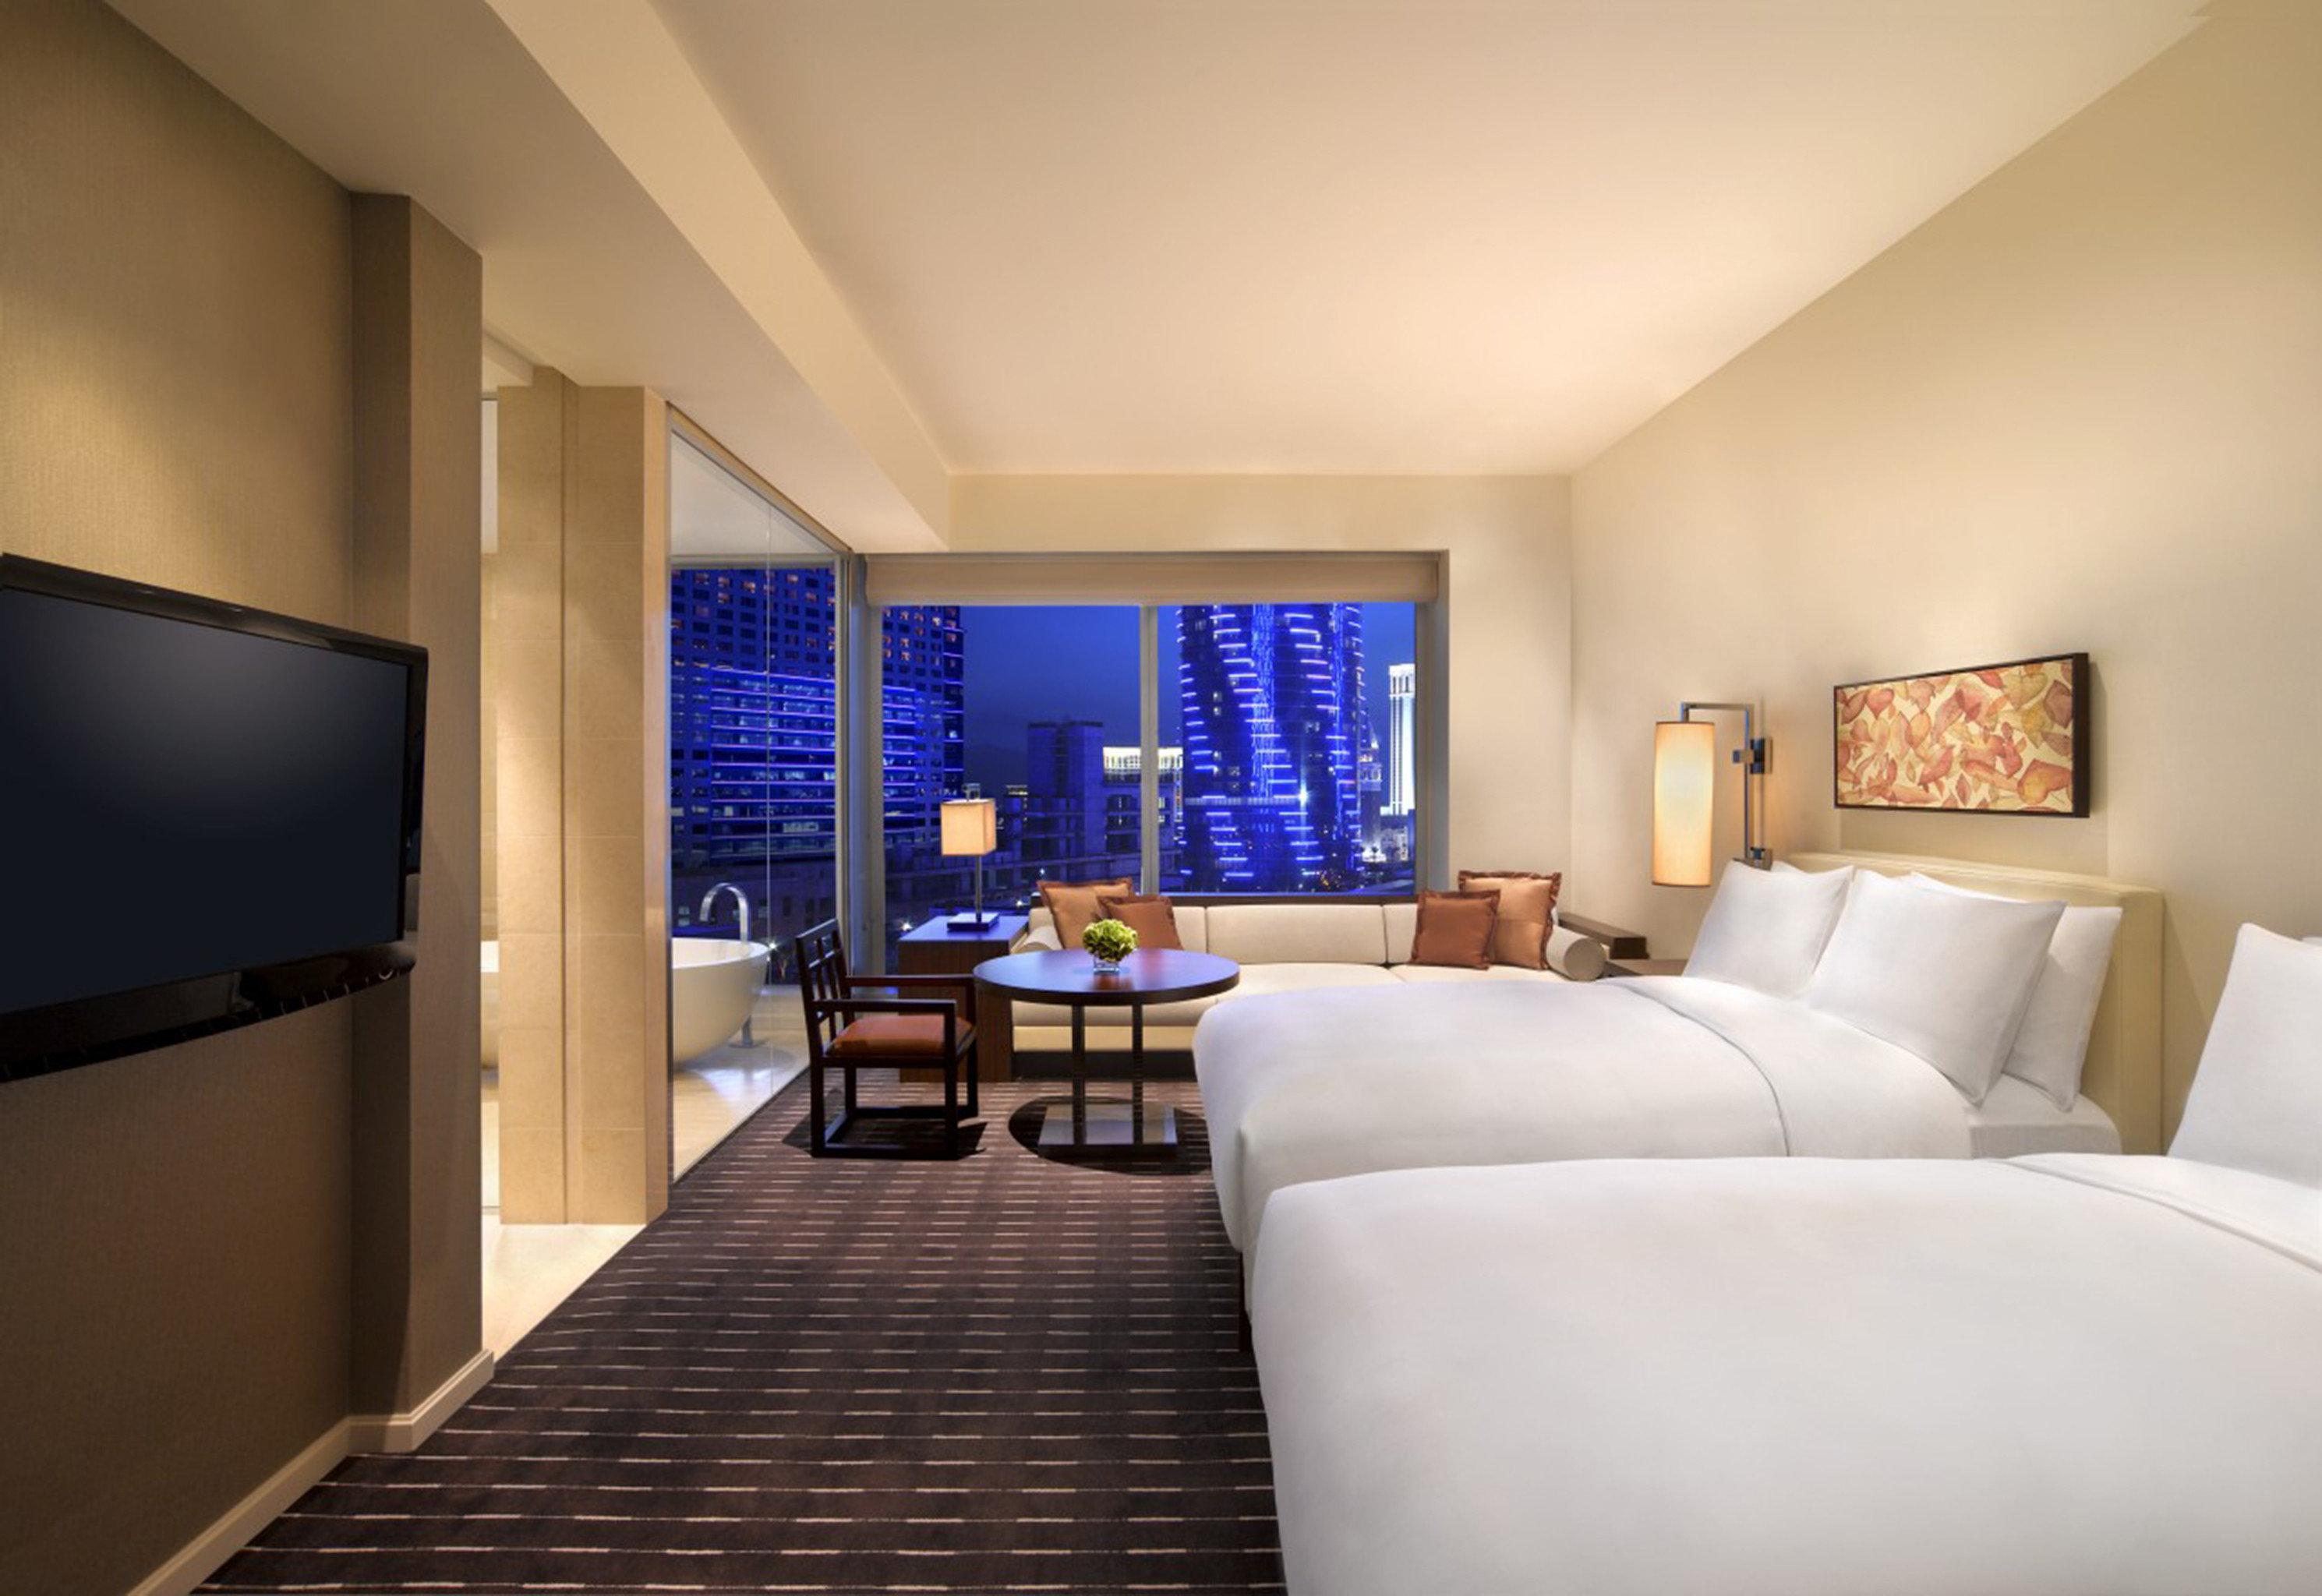 Bedroom Luxury Suite sofa property living room condominium home